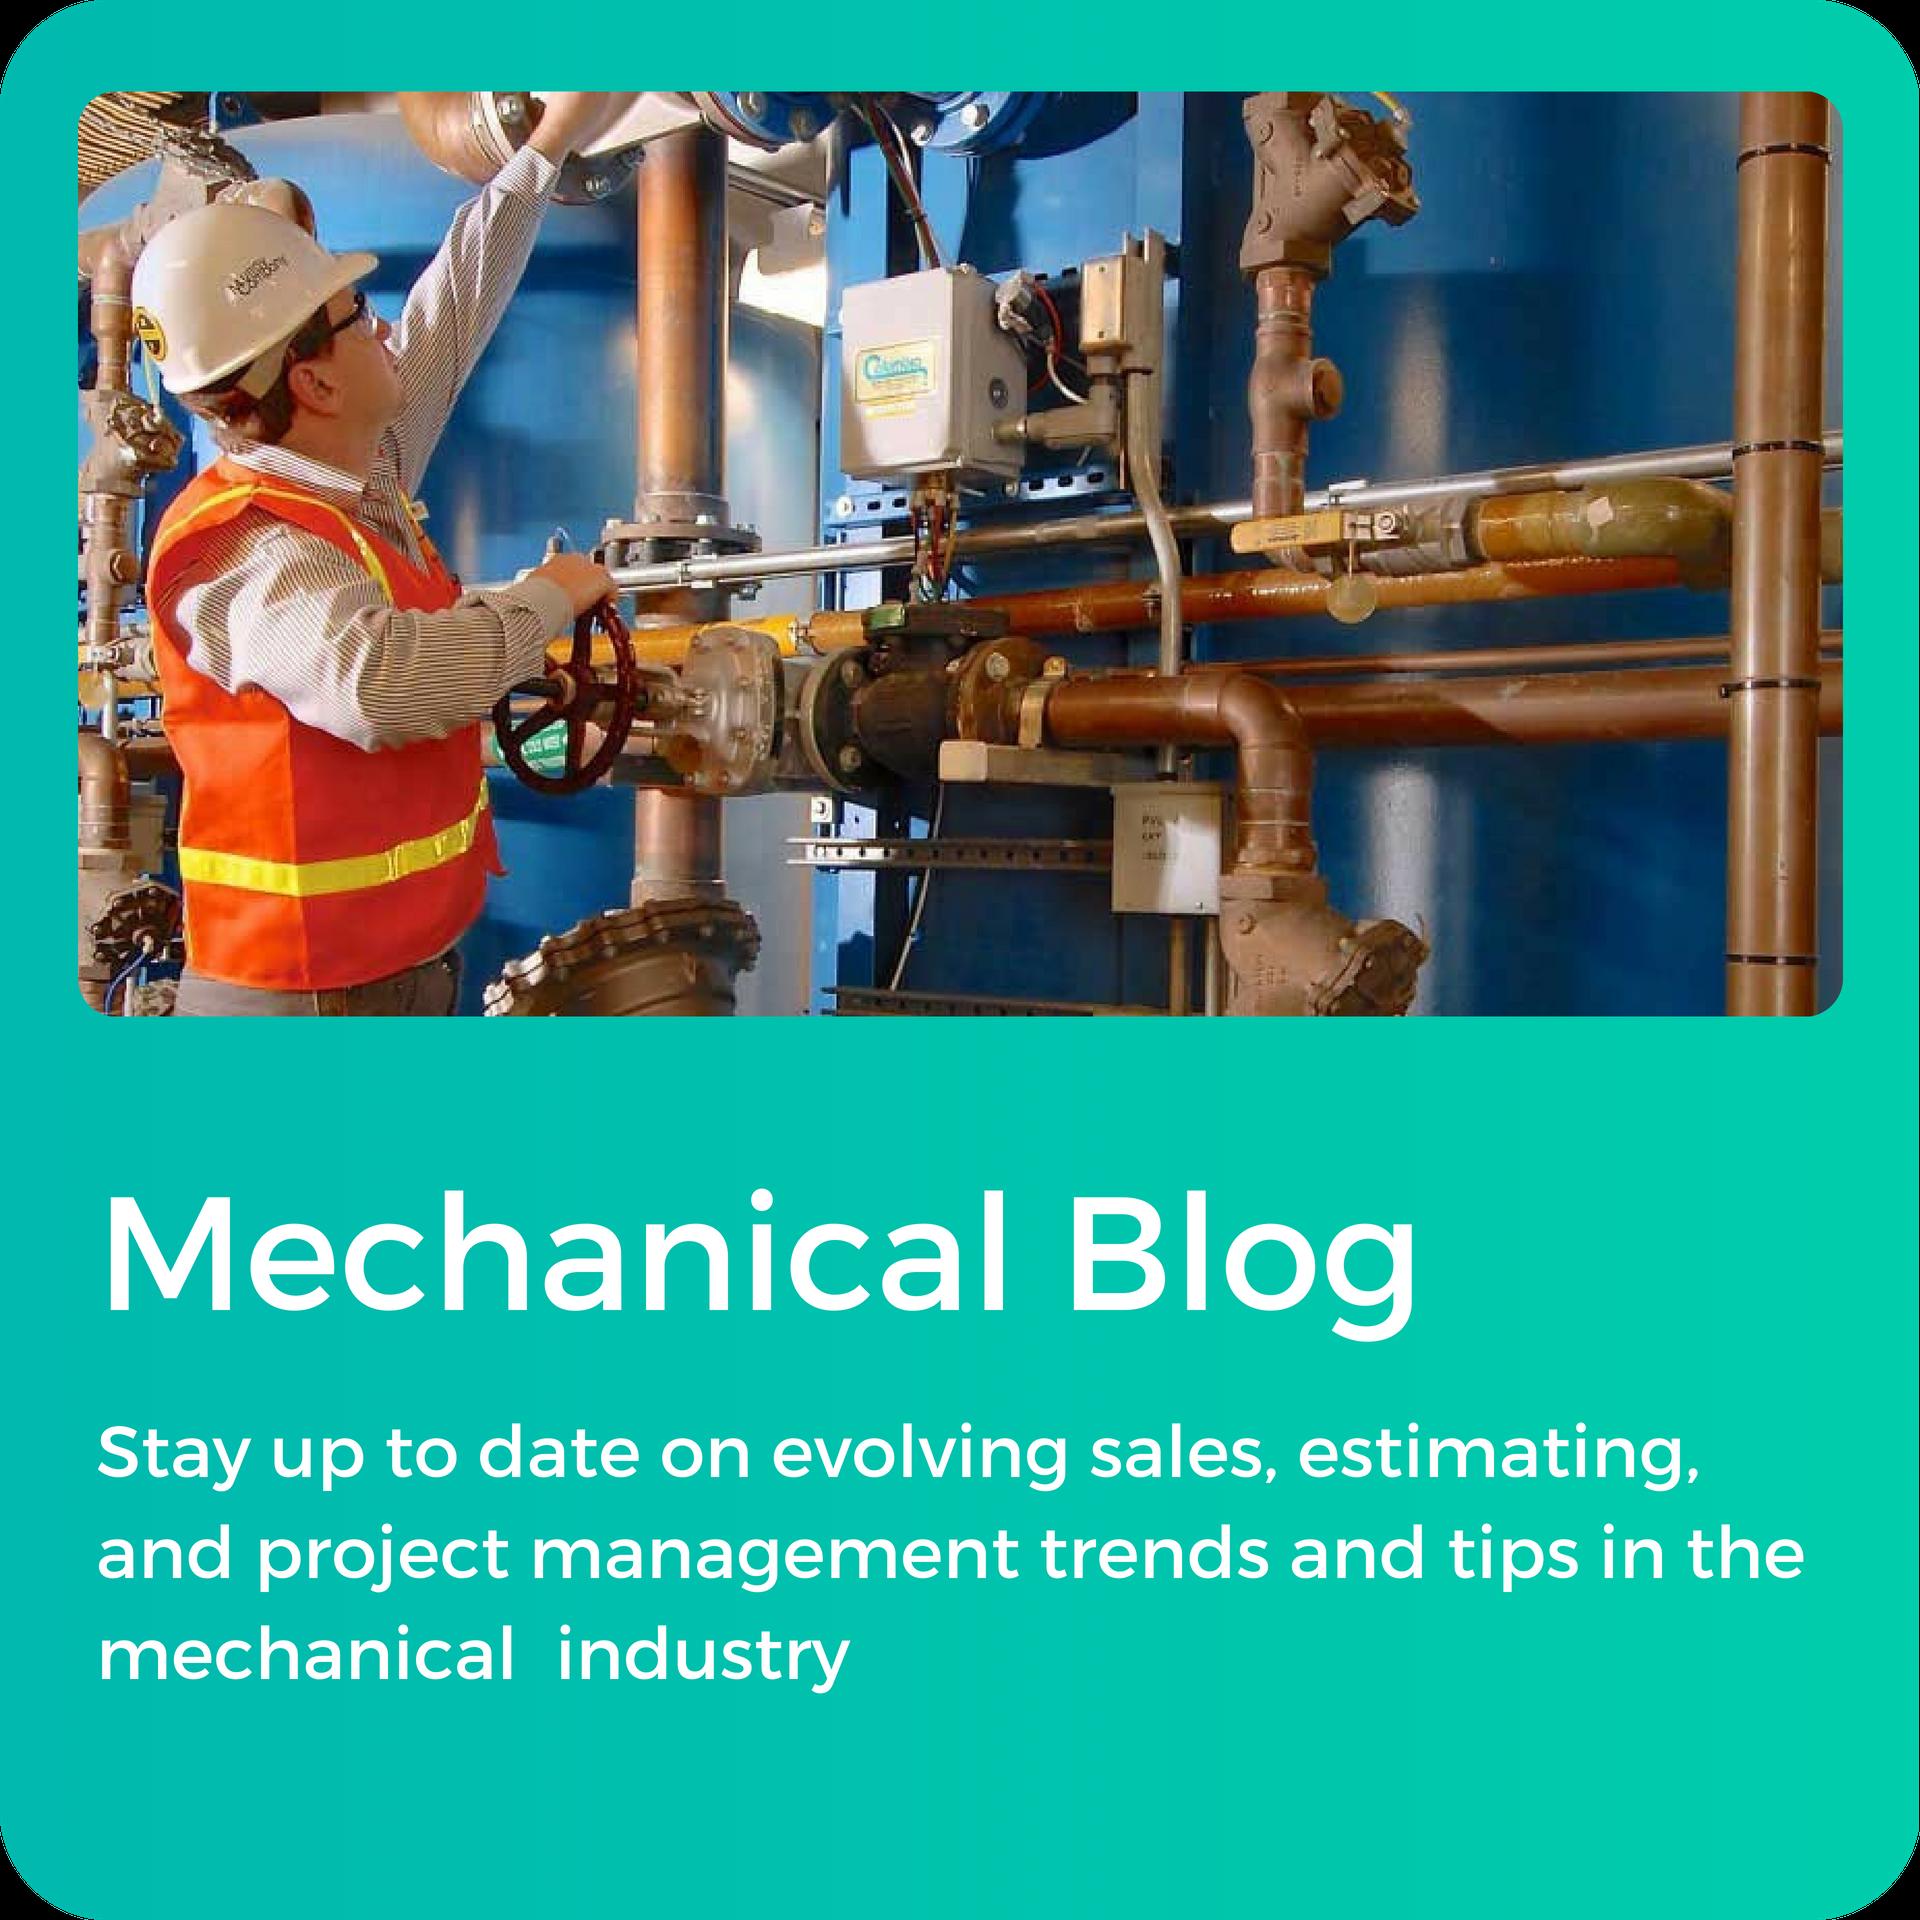 Mechanical blog